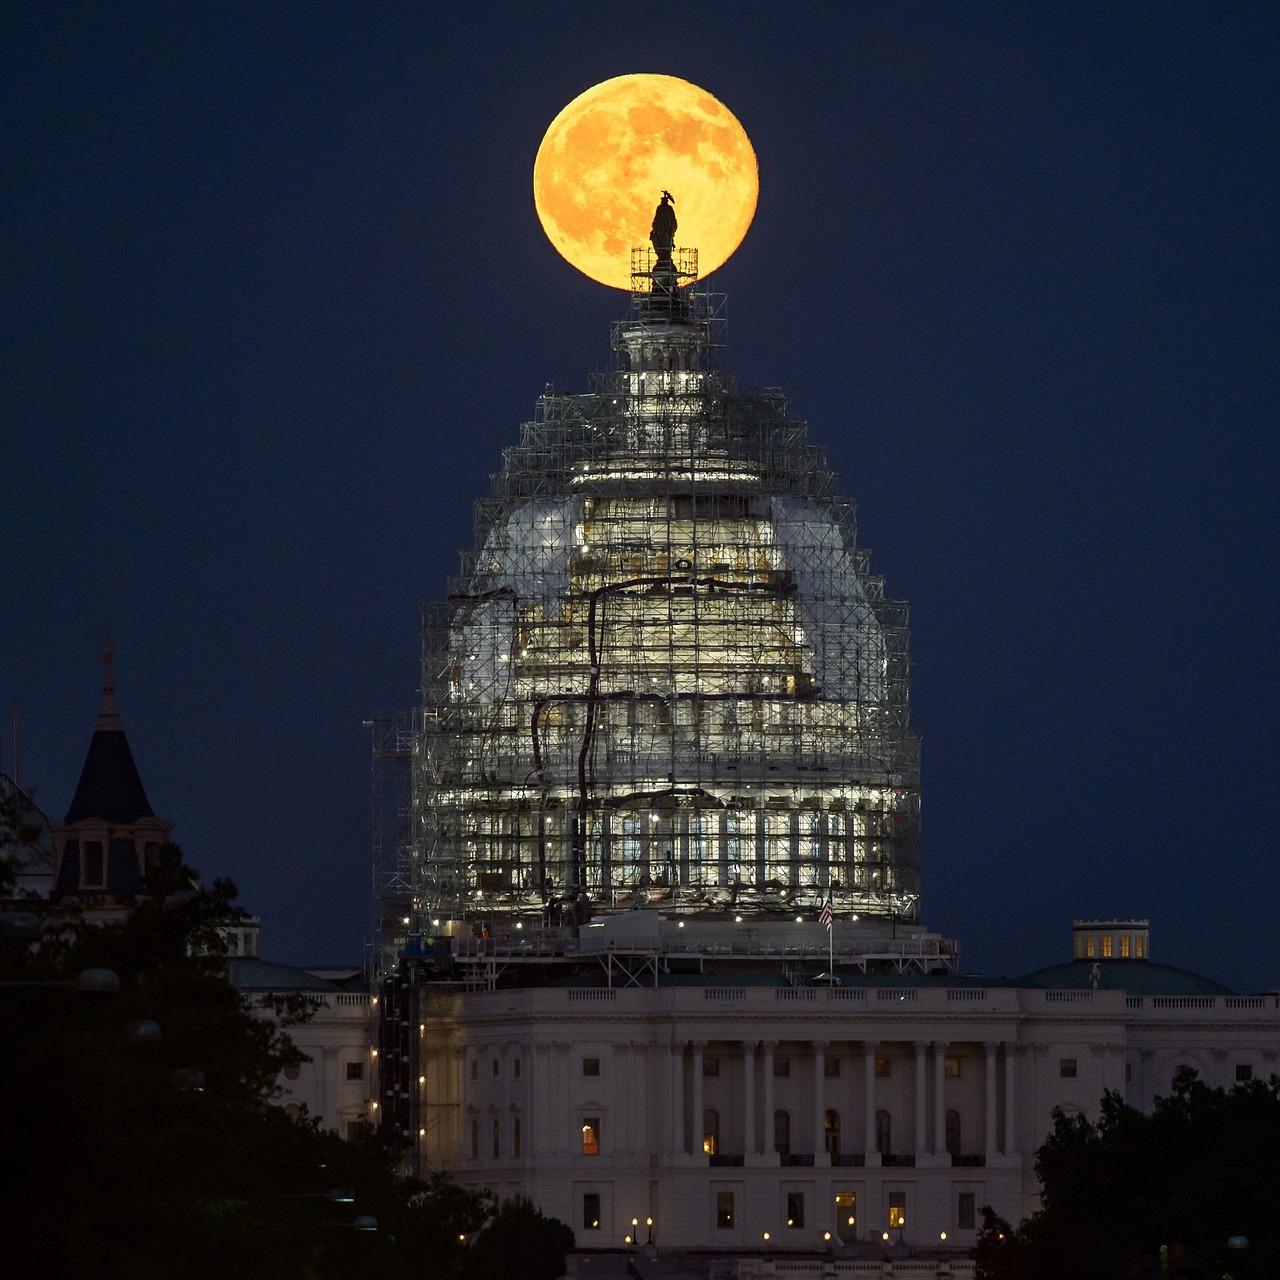 full-moon-1737997_1280